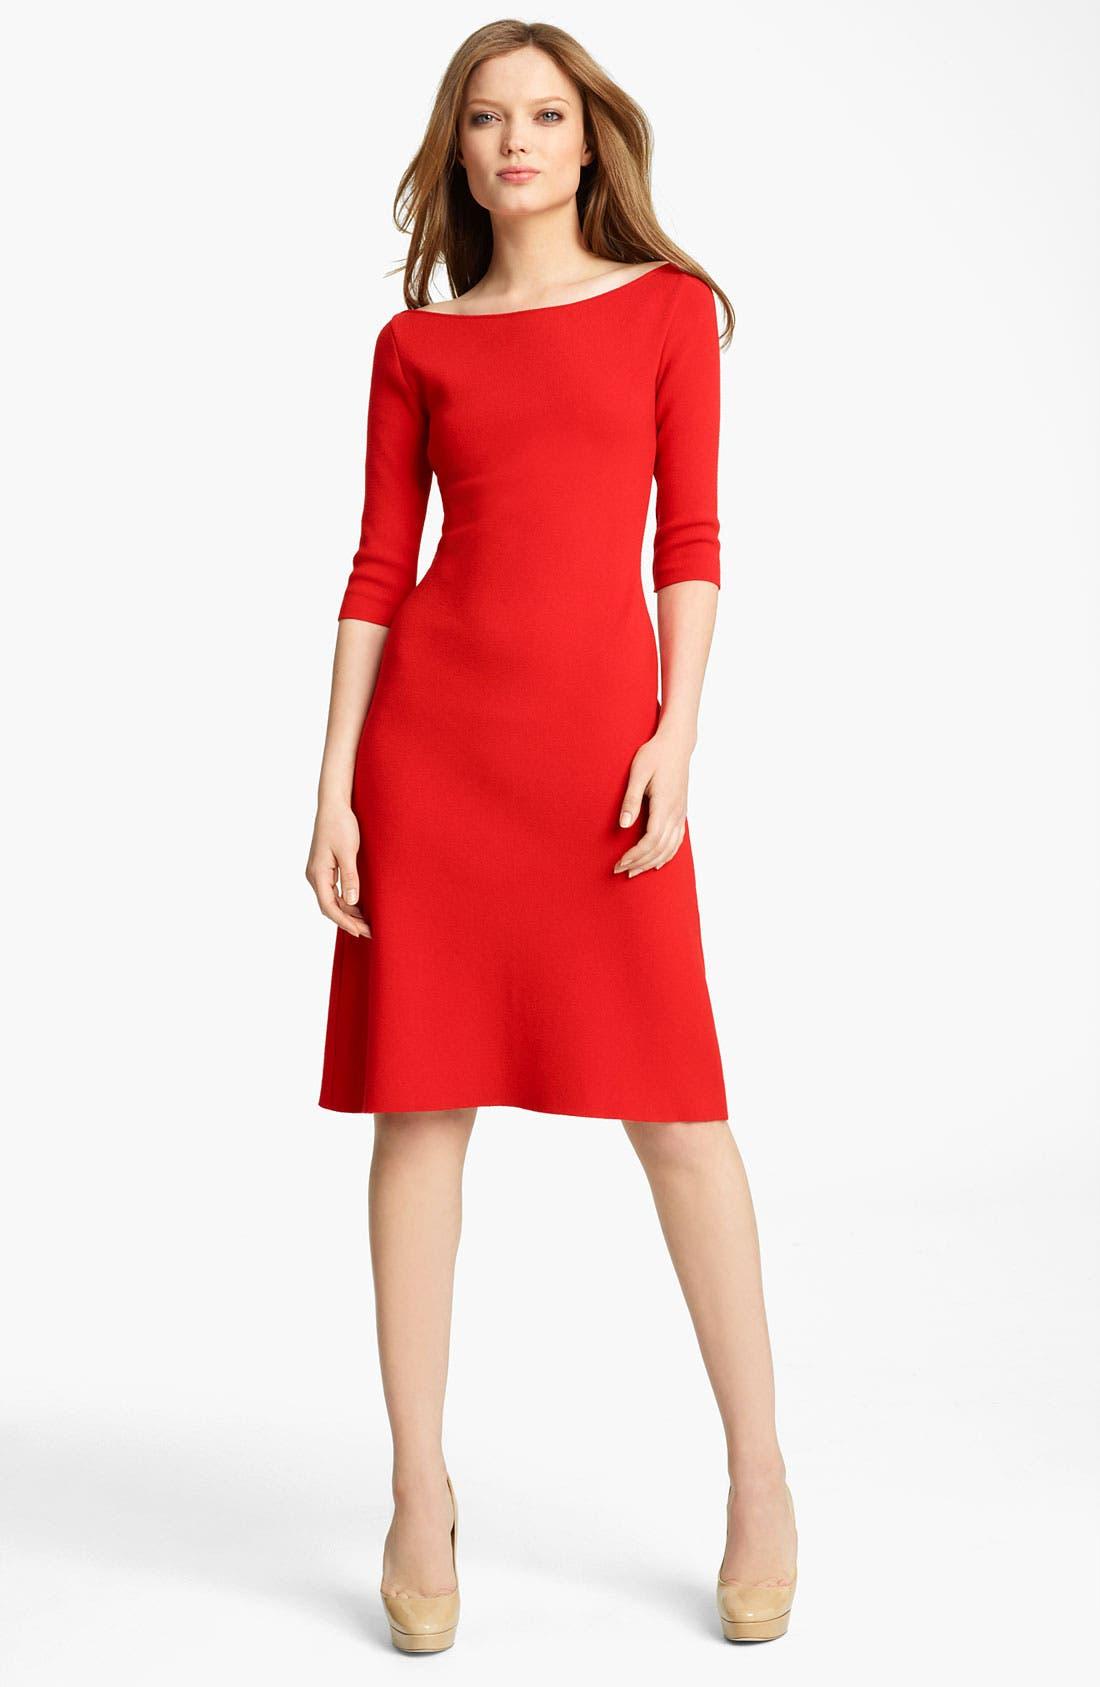 Alternate Image 1 Selected - Blumarine Sponge Knit Dress